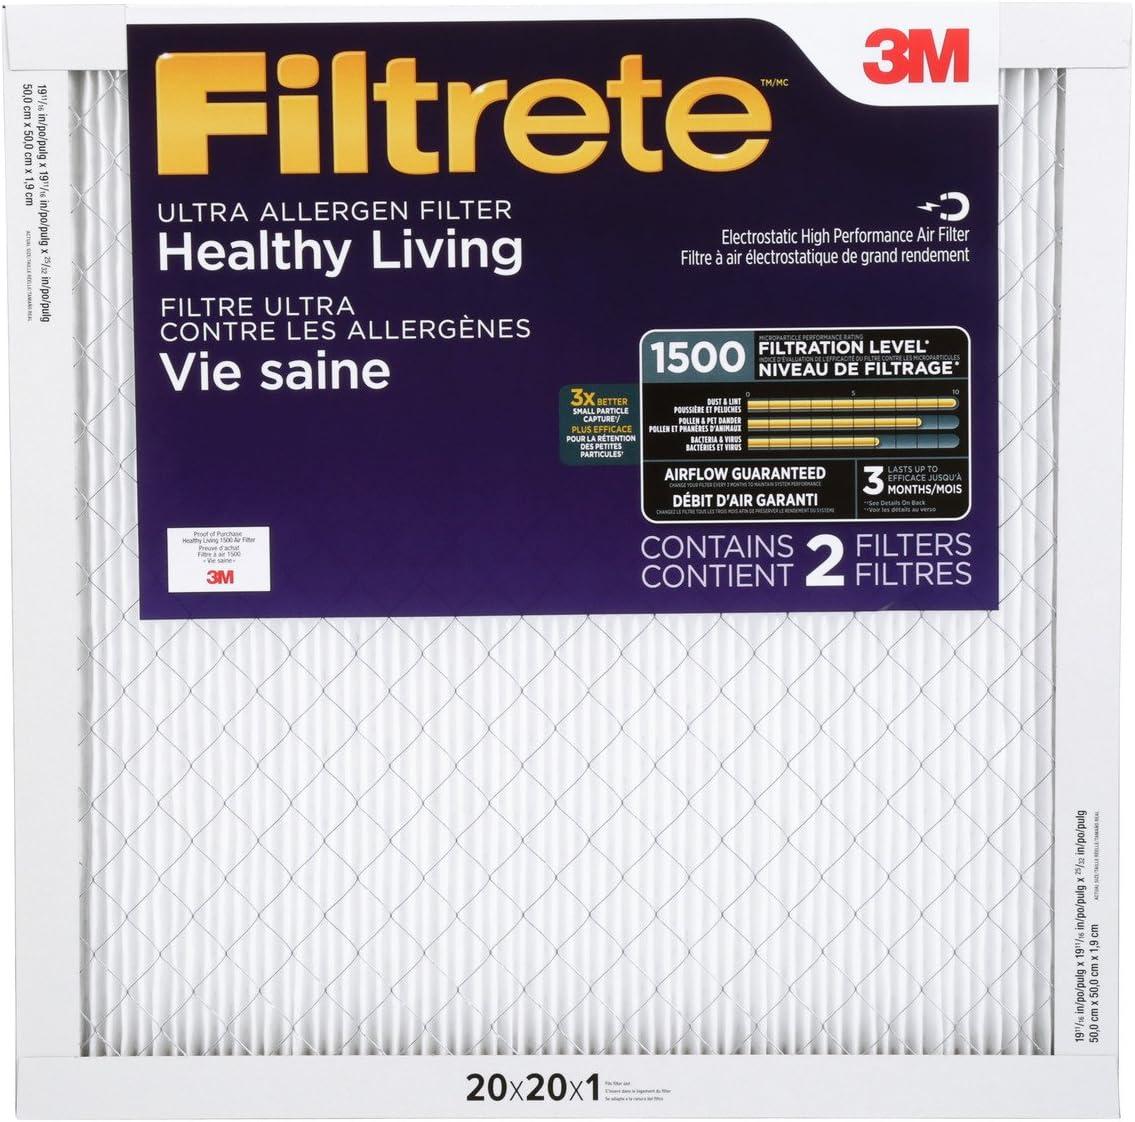 3M Filtrete 20x20x1 Ultra Allergen Reduction Air Filter